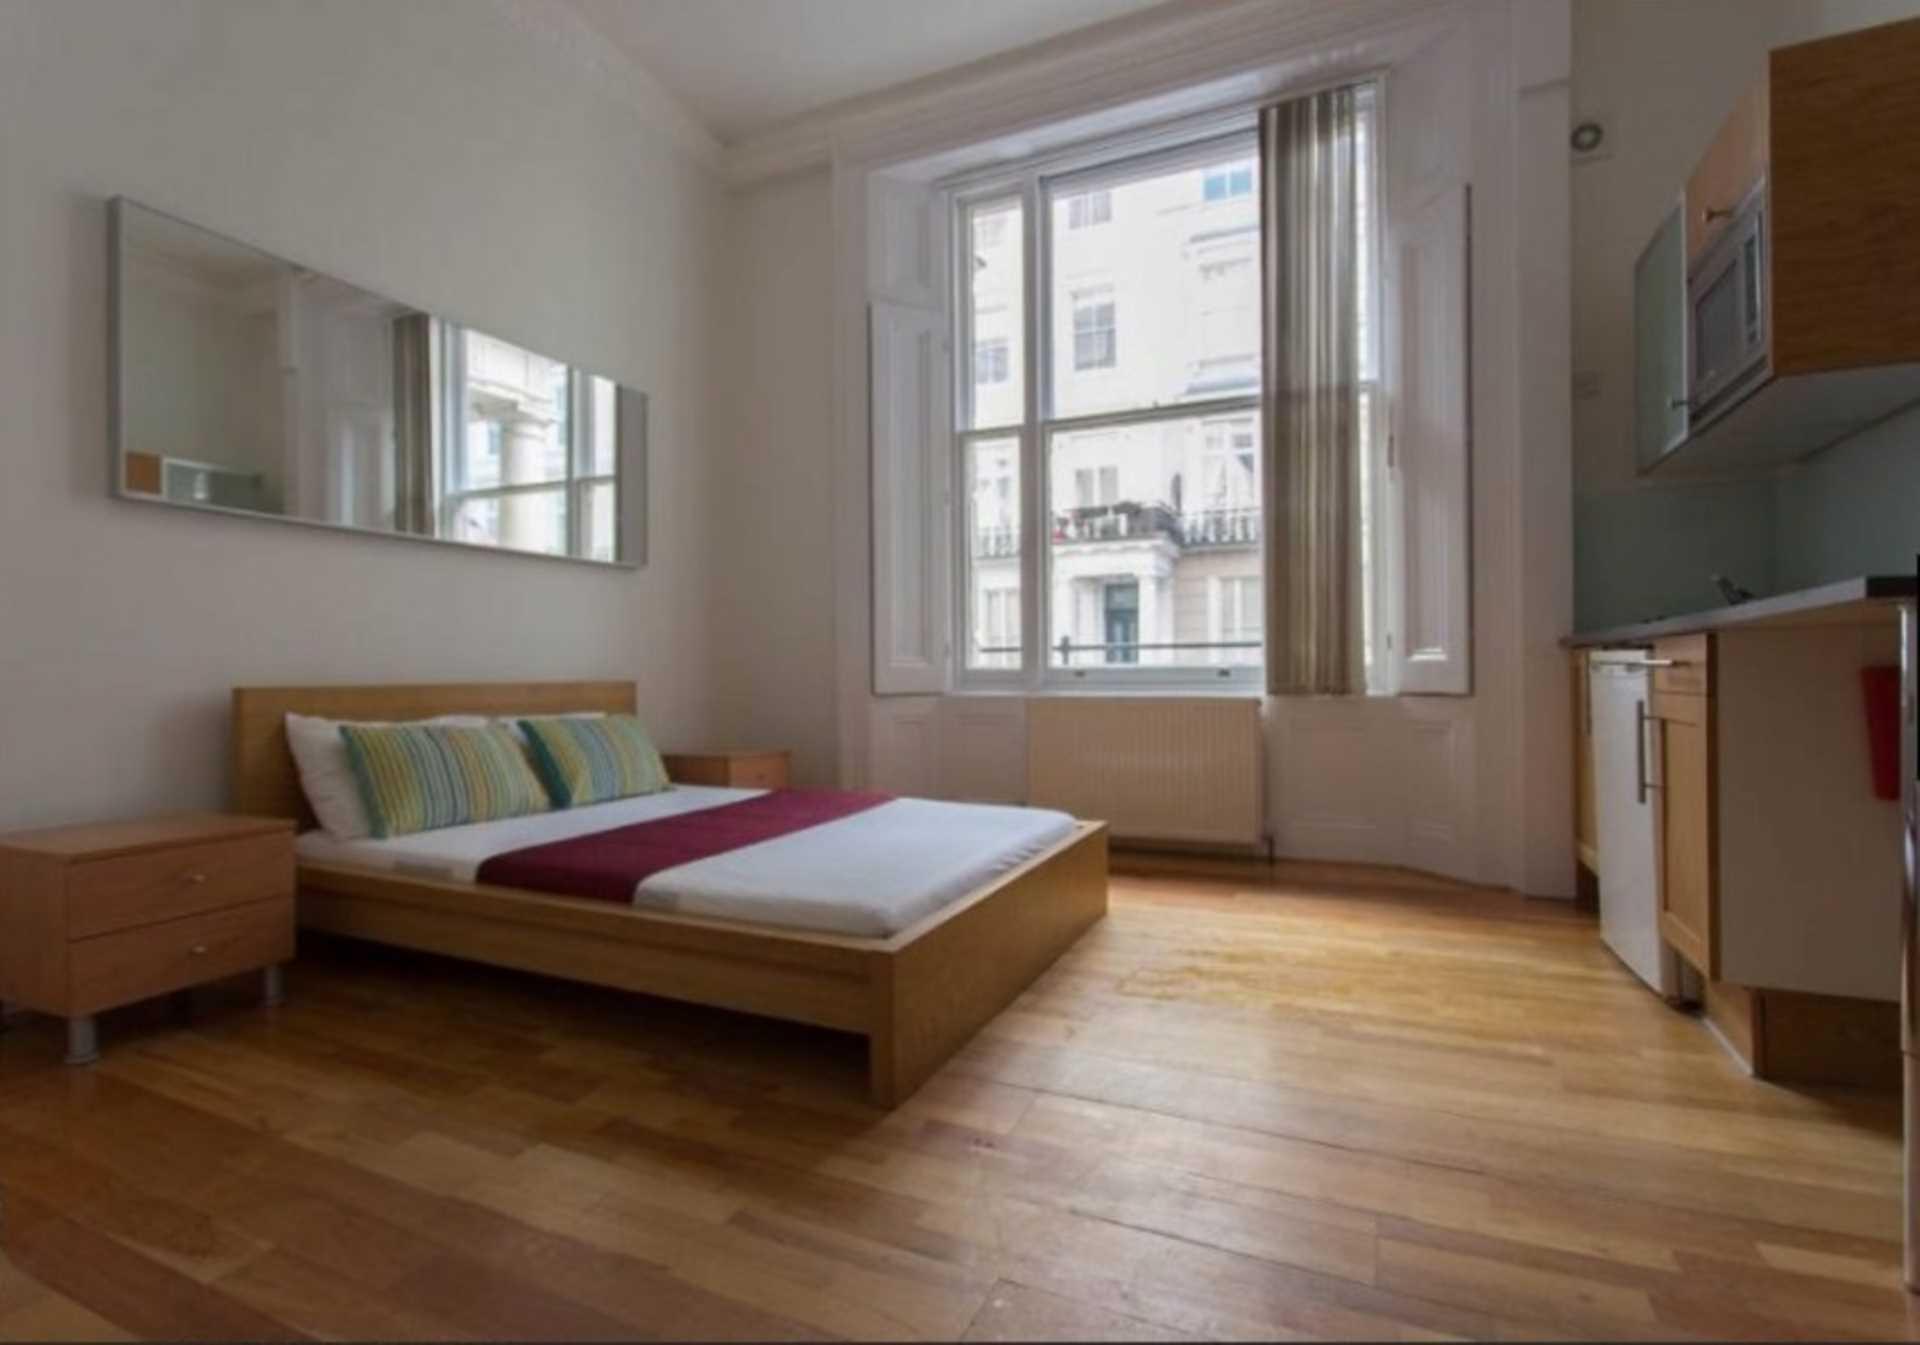 Studio flat to rent queensborough terrace london w2 3sh for 64 queensborough terrace bayswater london w2 3sh